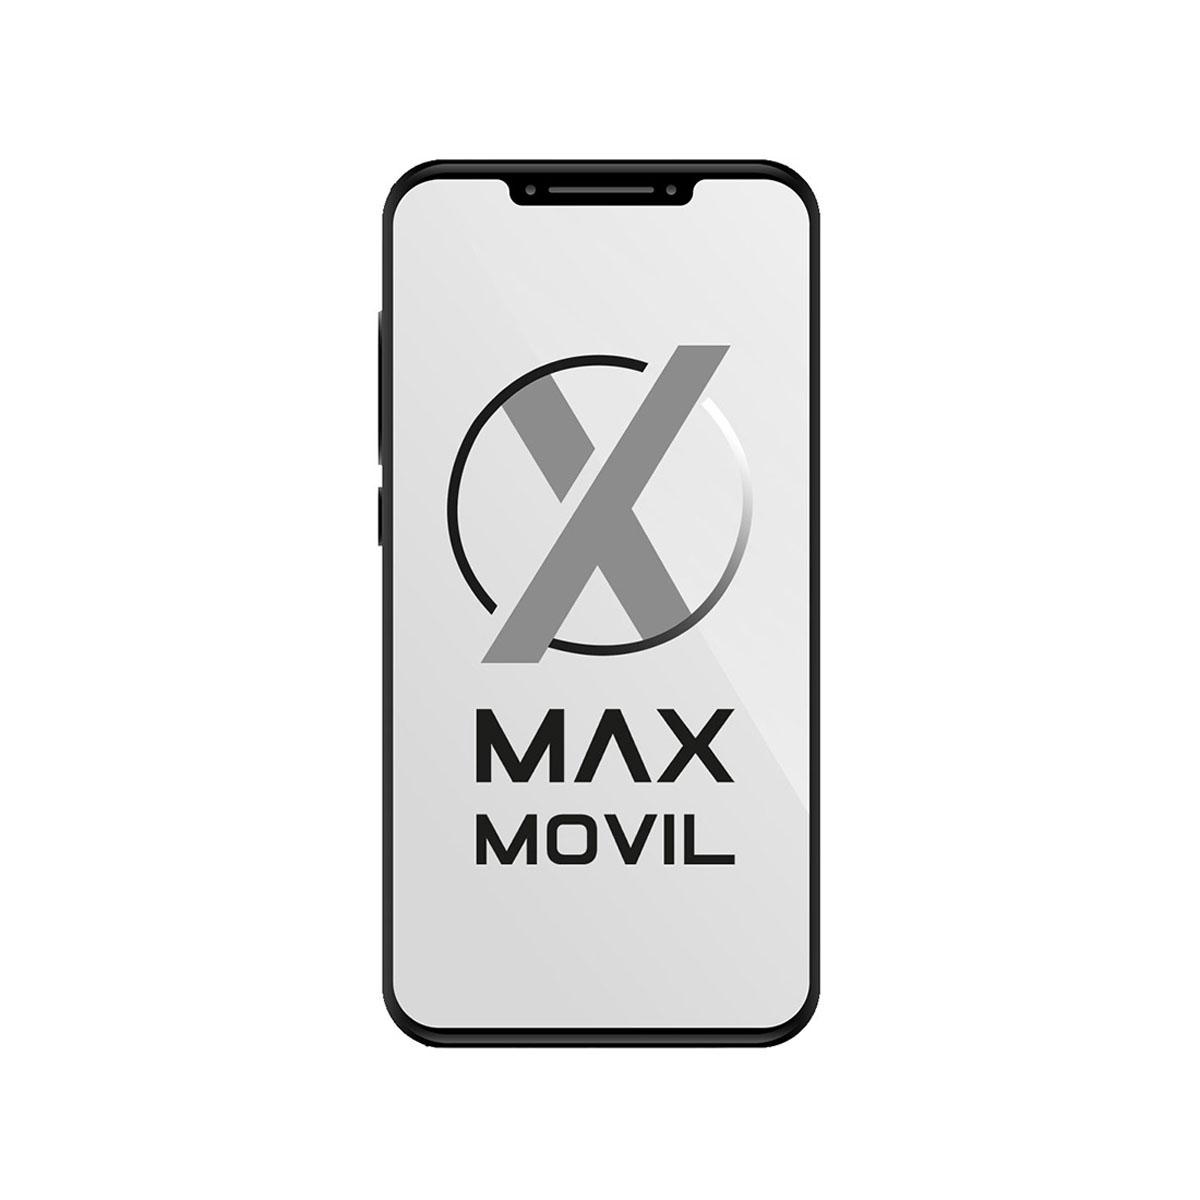 Catalogo Valeo parking sensor 2018 Comprar Online Barato · MaxMovil ⓴⓳